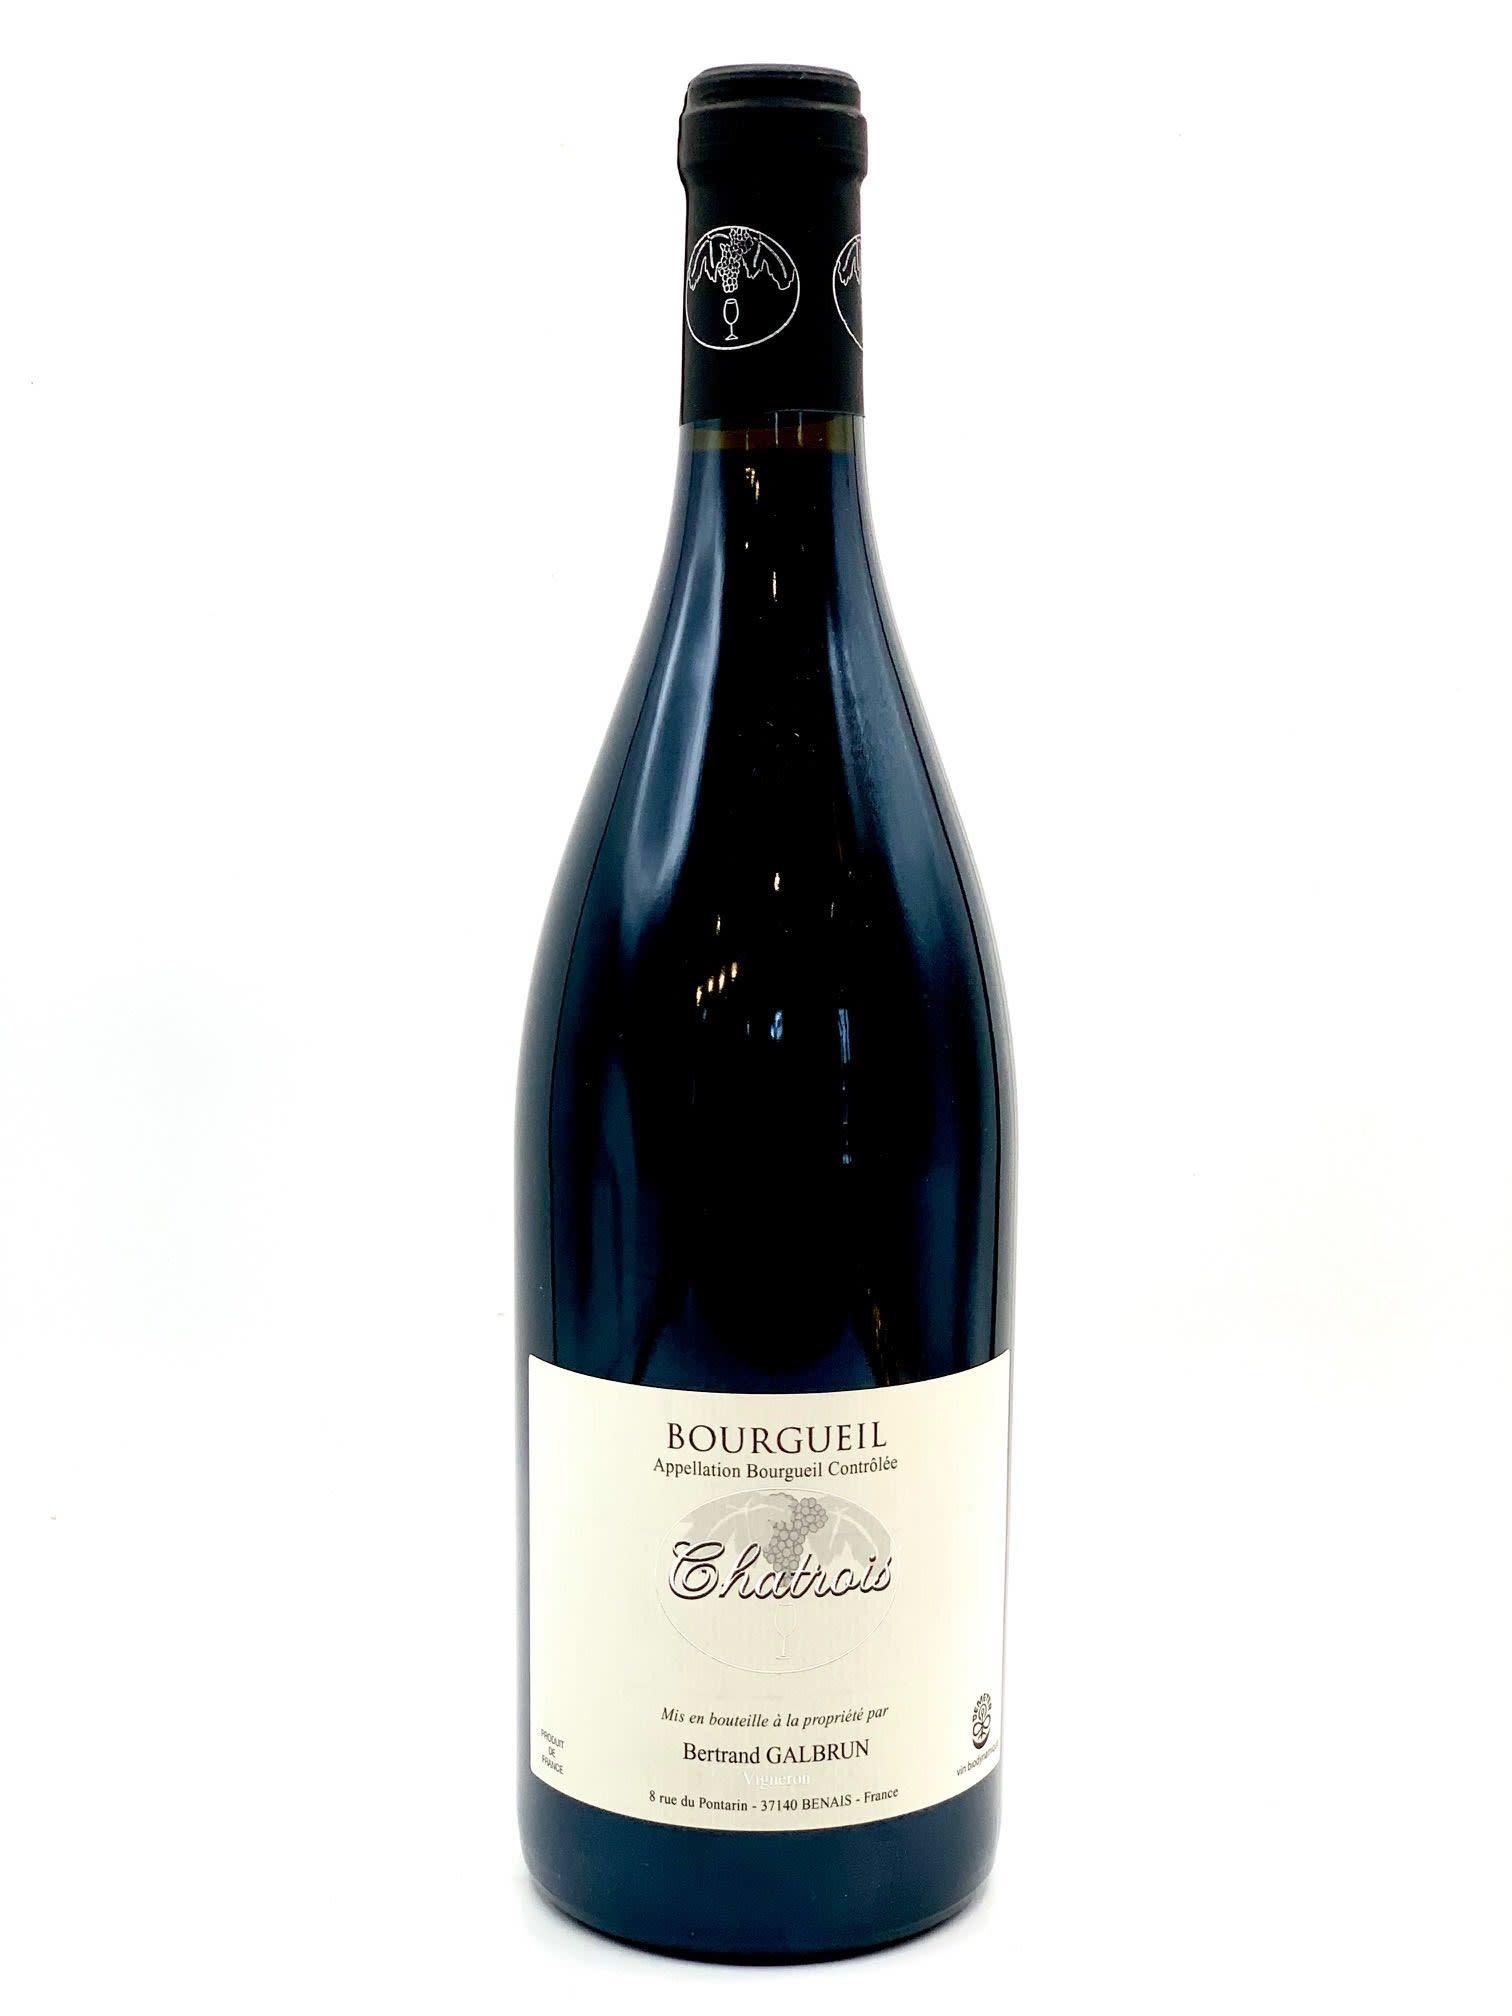 Bourgueil 2018/19 Bertrand Galbrun 'Chatrois' 750ml